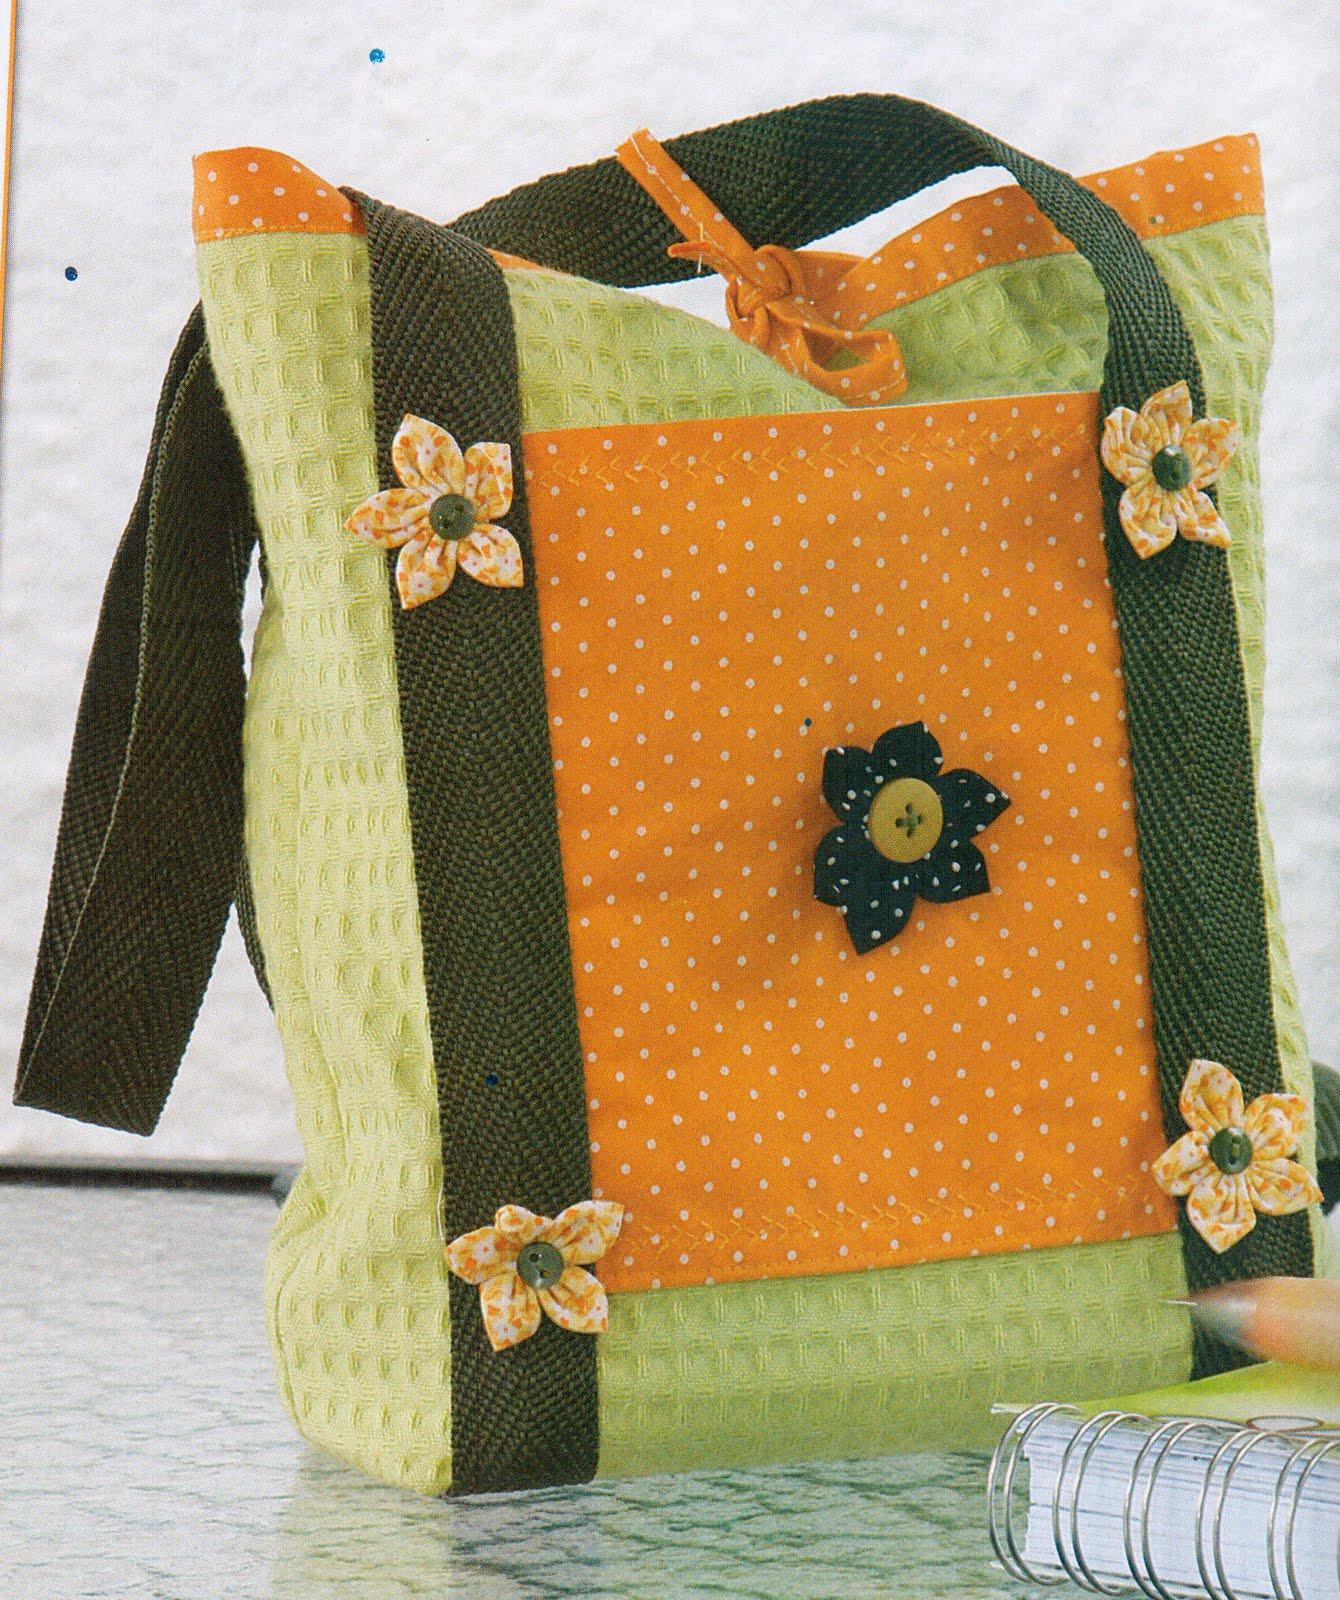 Bolsa De Fuxico Artesanato : Sidney artesanato bolsa com enfeites de fuxico